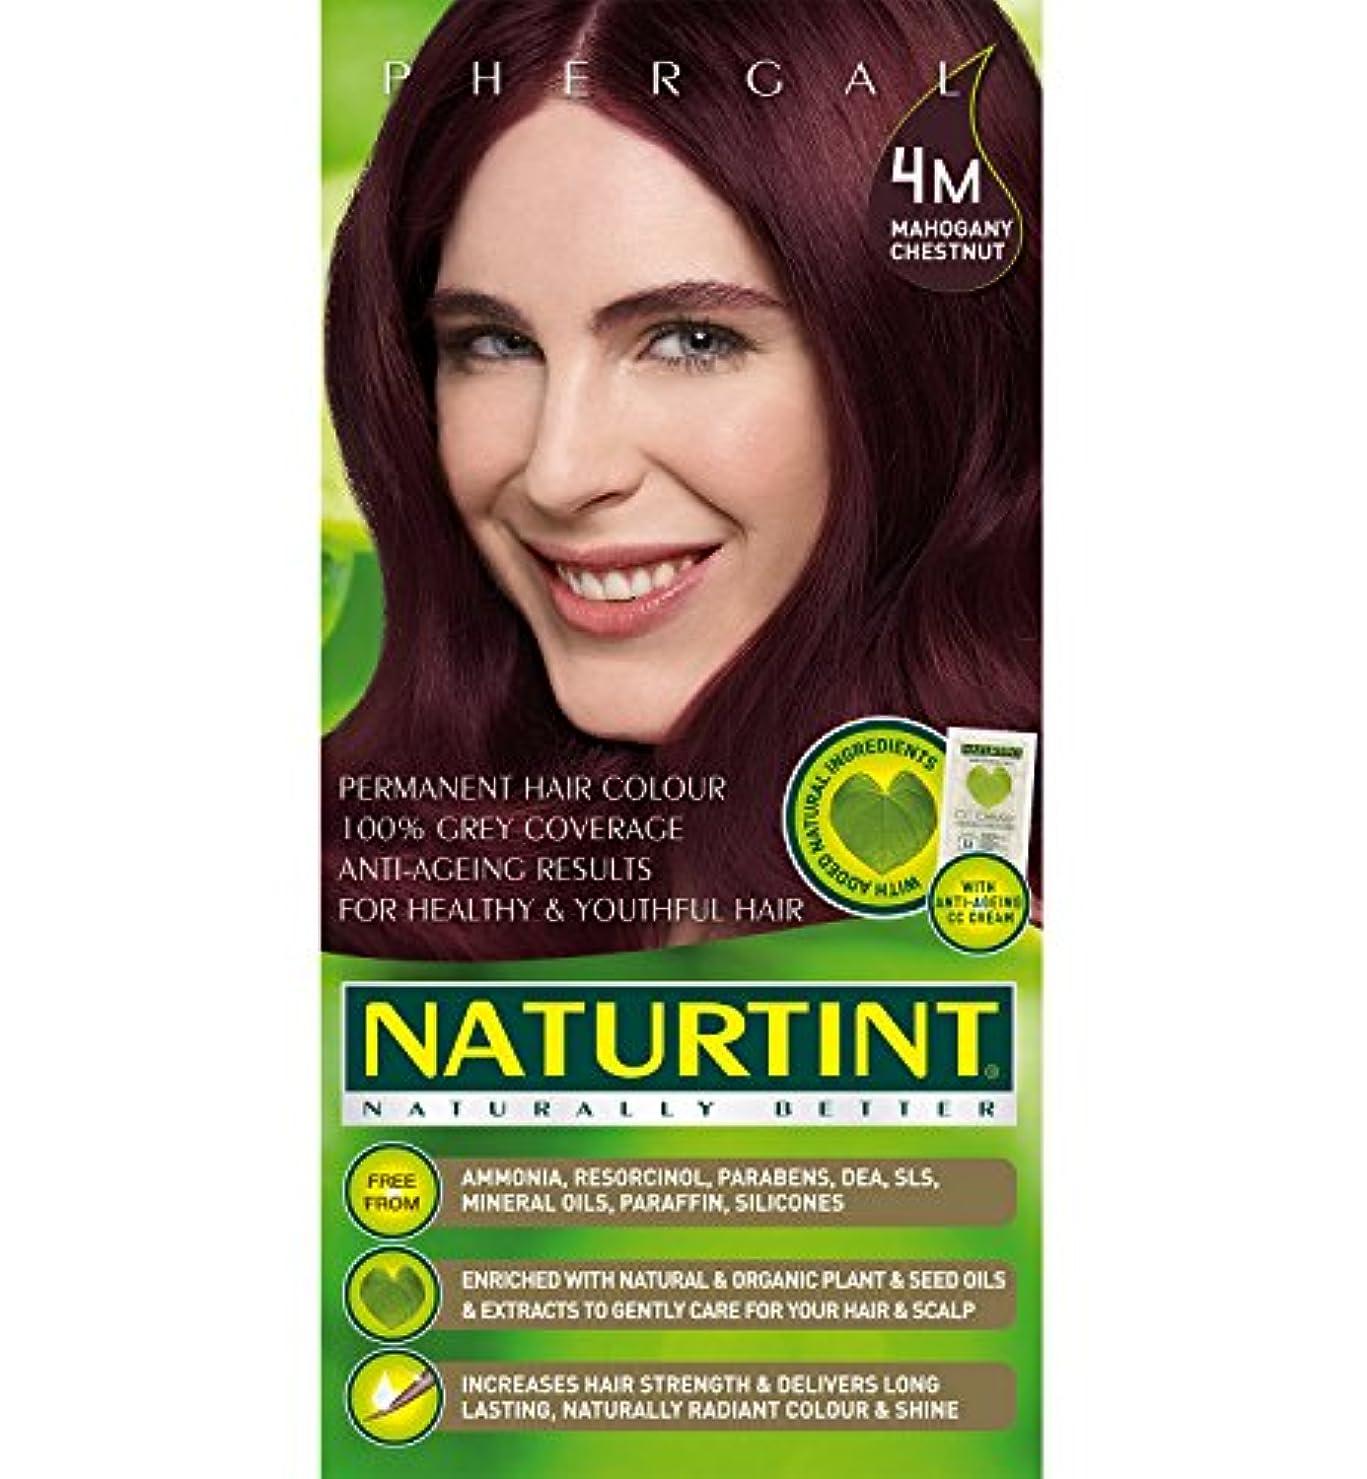 Naturtint Hair Color 4M Mahogany Chestnut Count (並行輸入品)